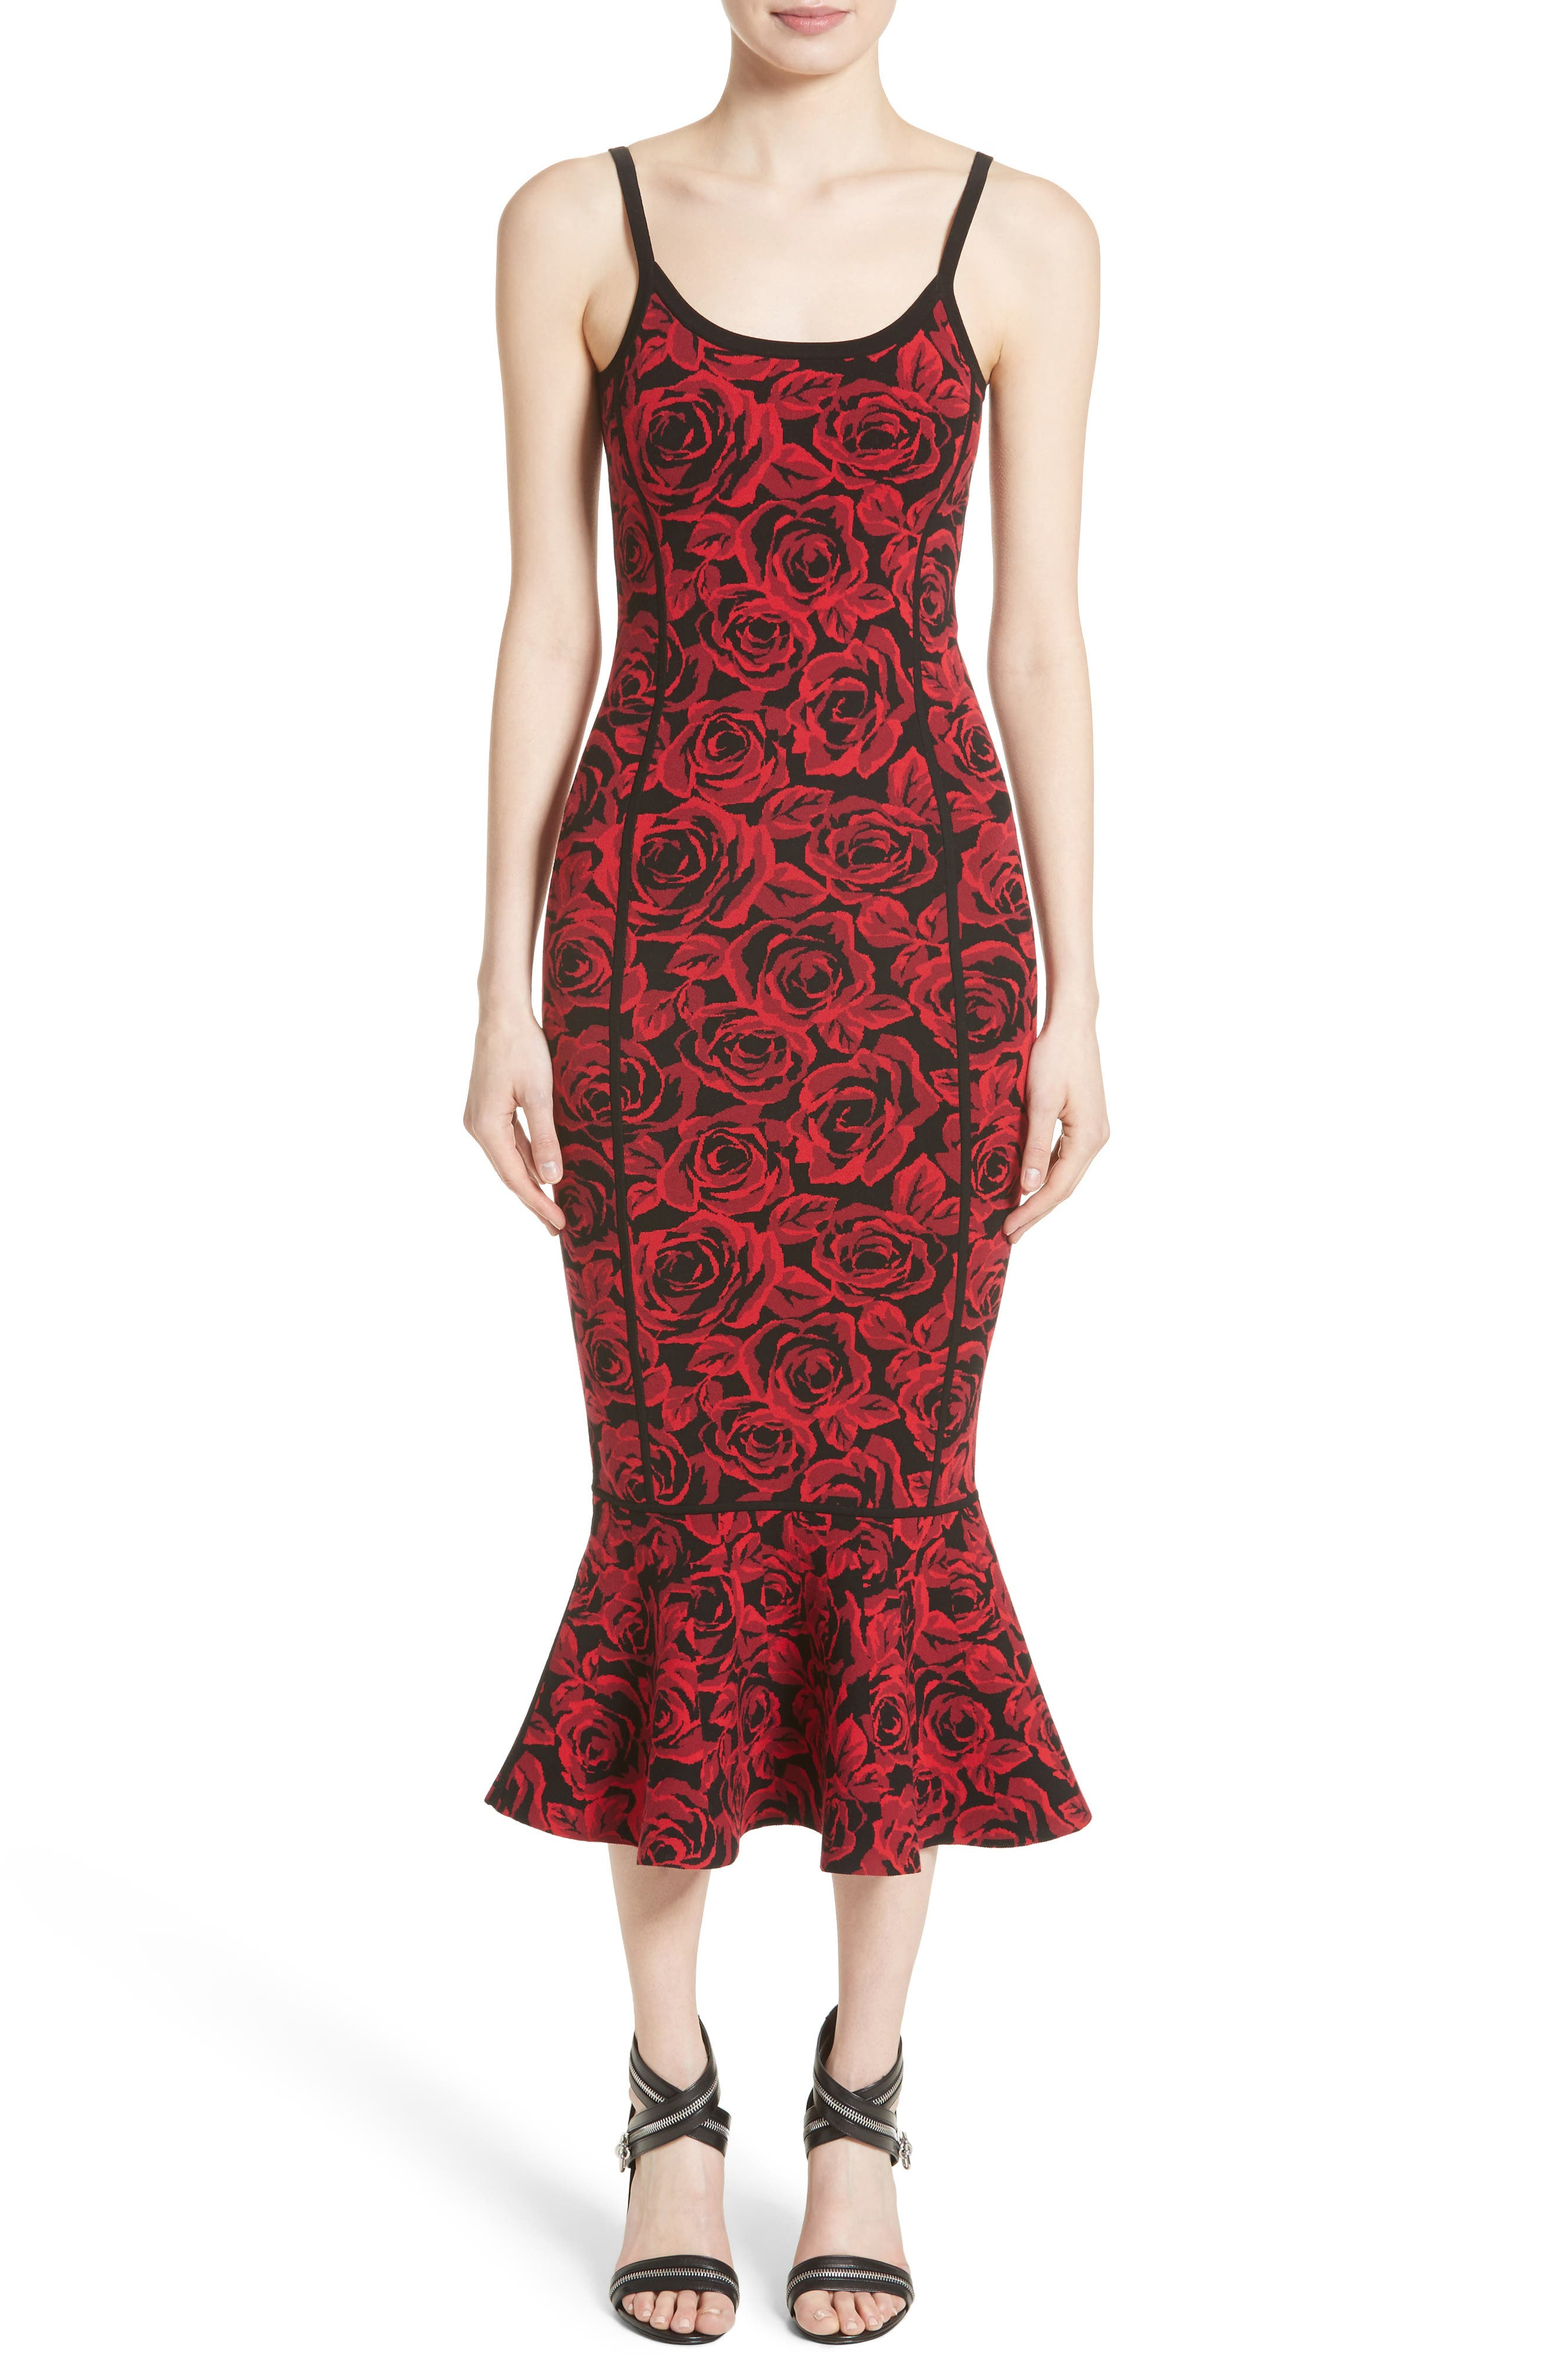 Alternate Image 1 Selected - Michael Kors Stretch Rose Jacquard Tank Dress